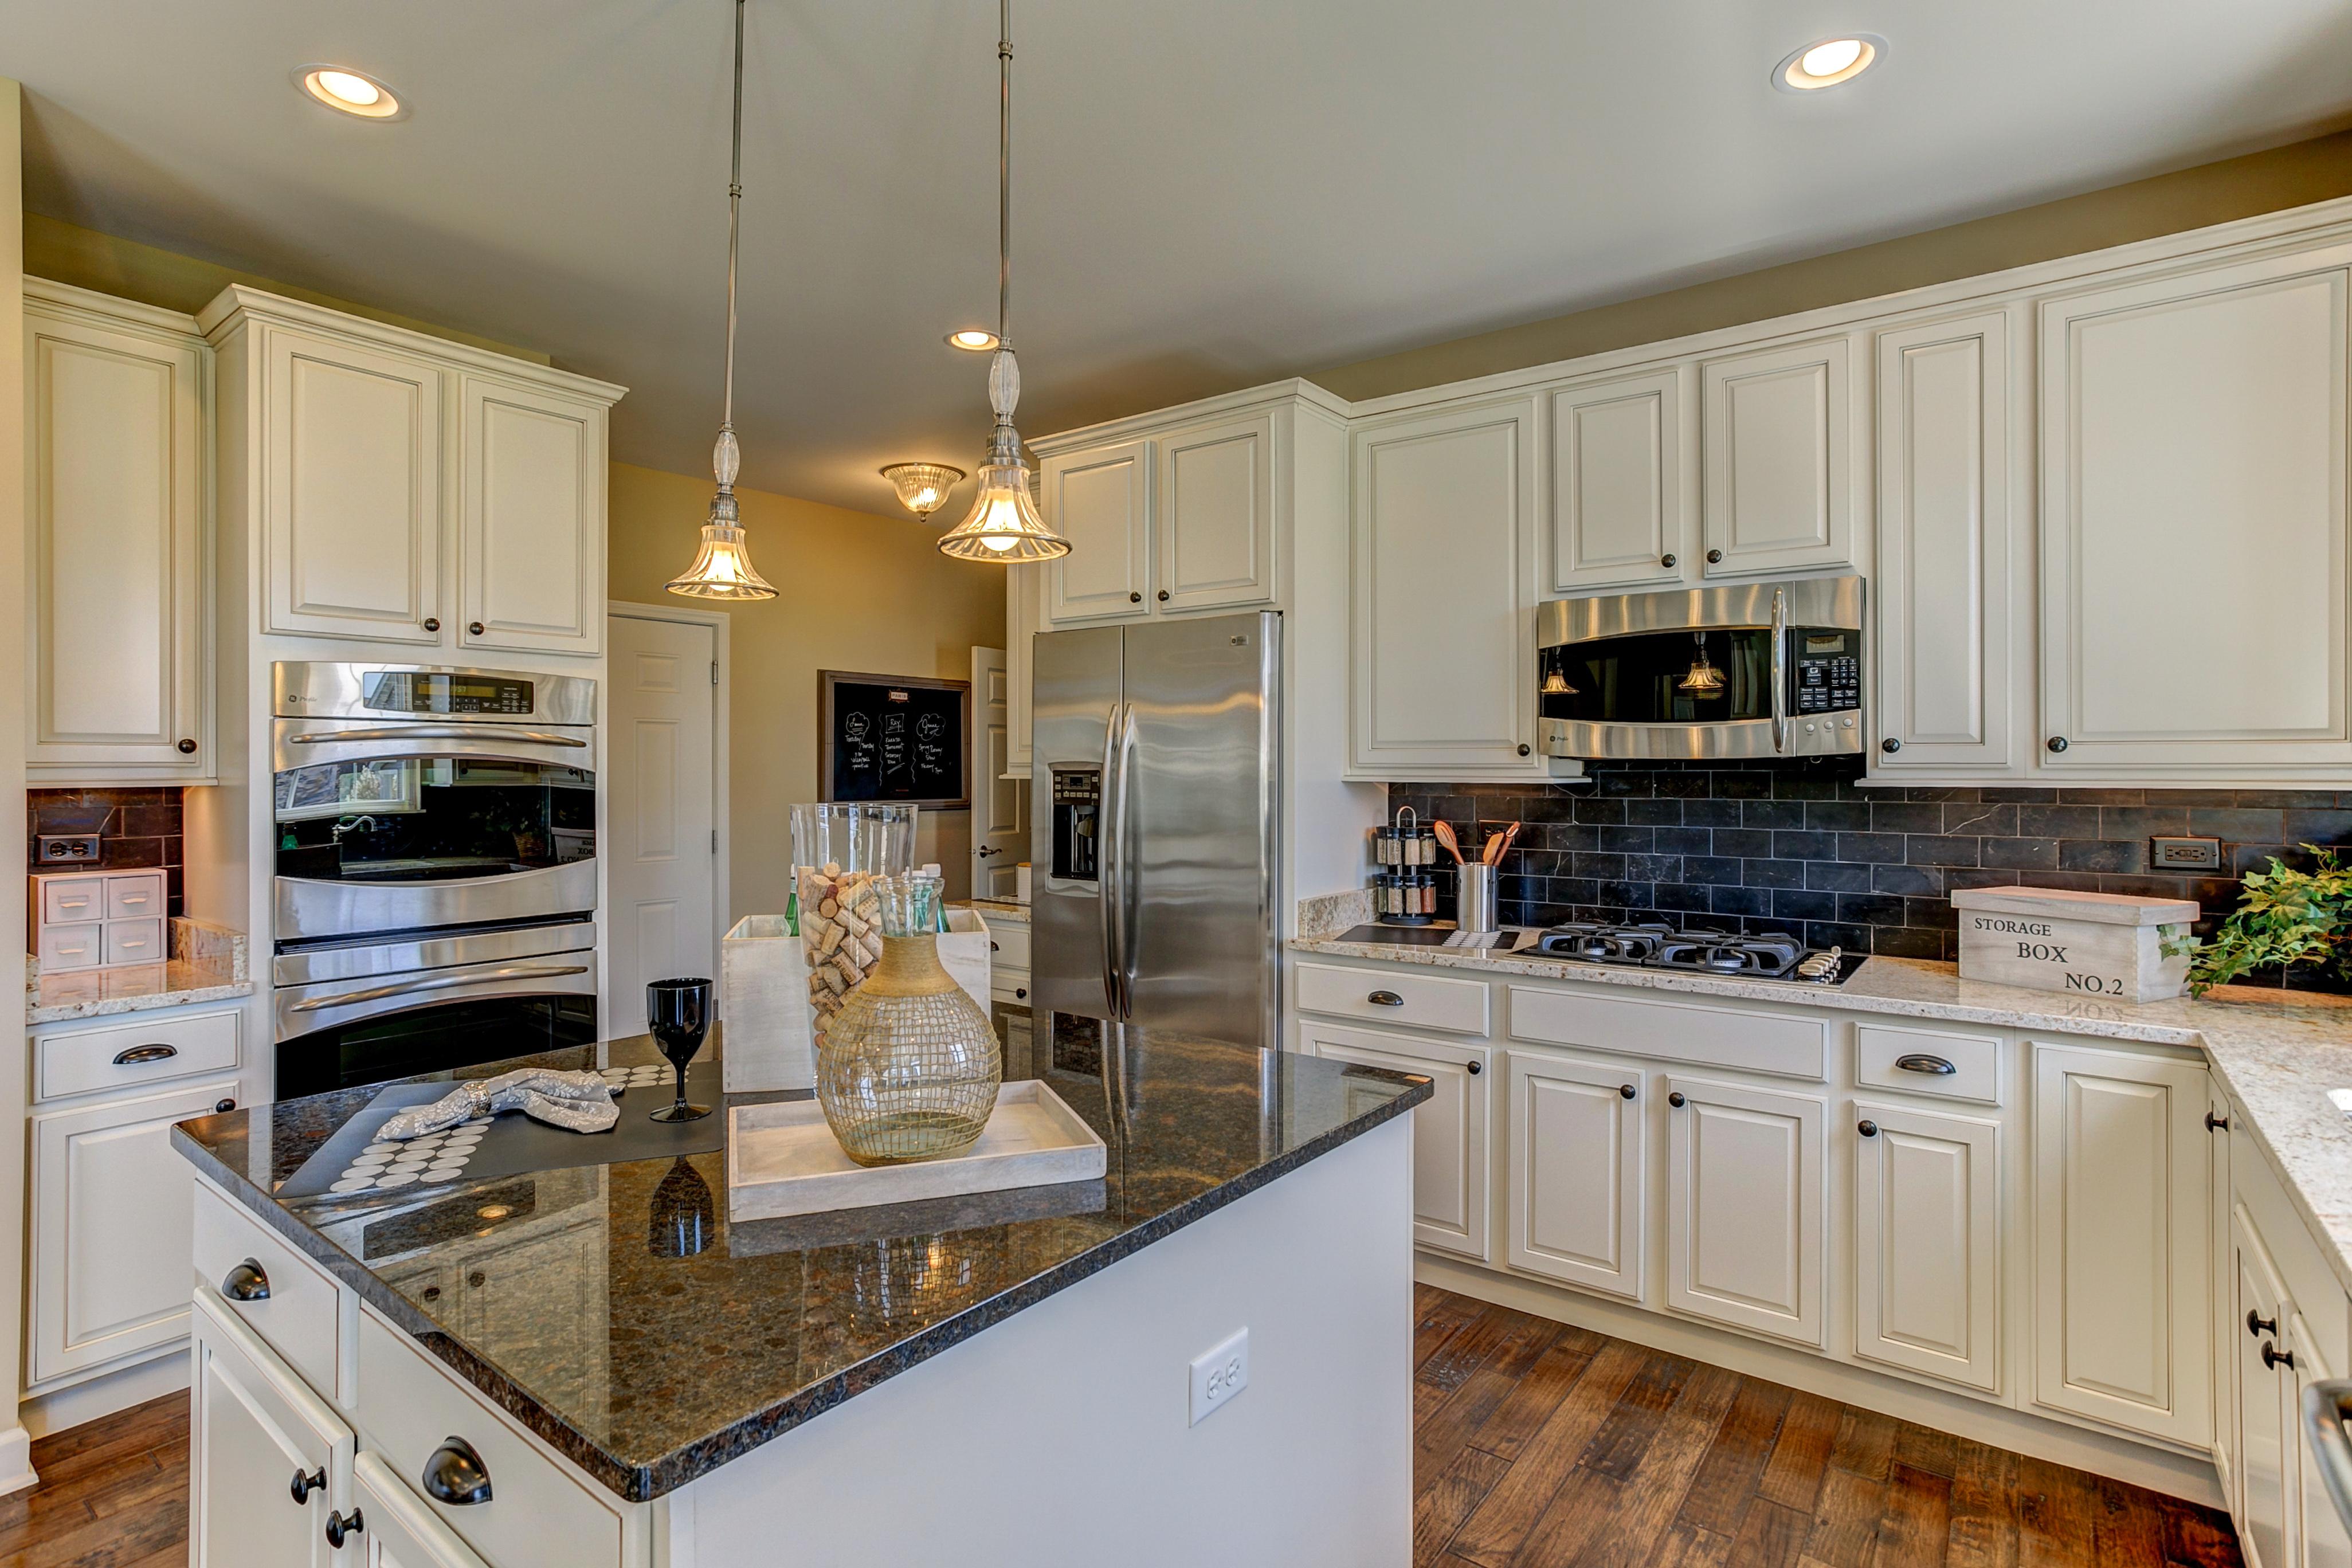 K Hovnanian Floor Plans: K. Hovnanian® Homes Celebrates Grand Opening Of The